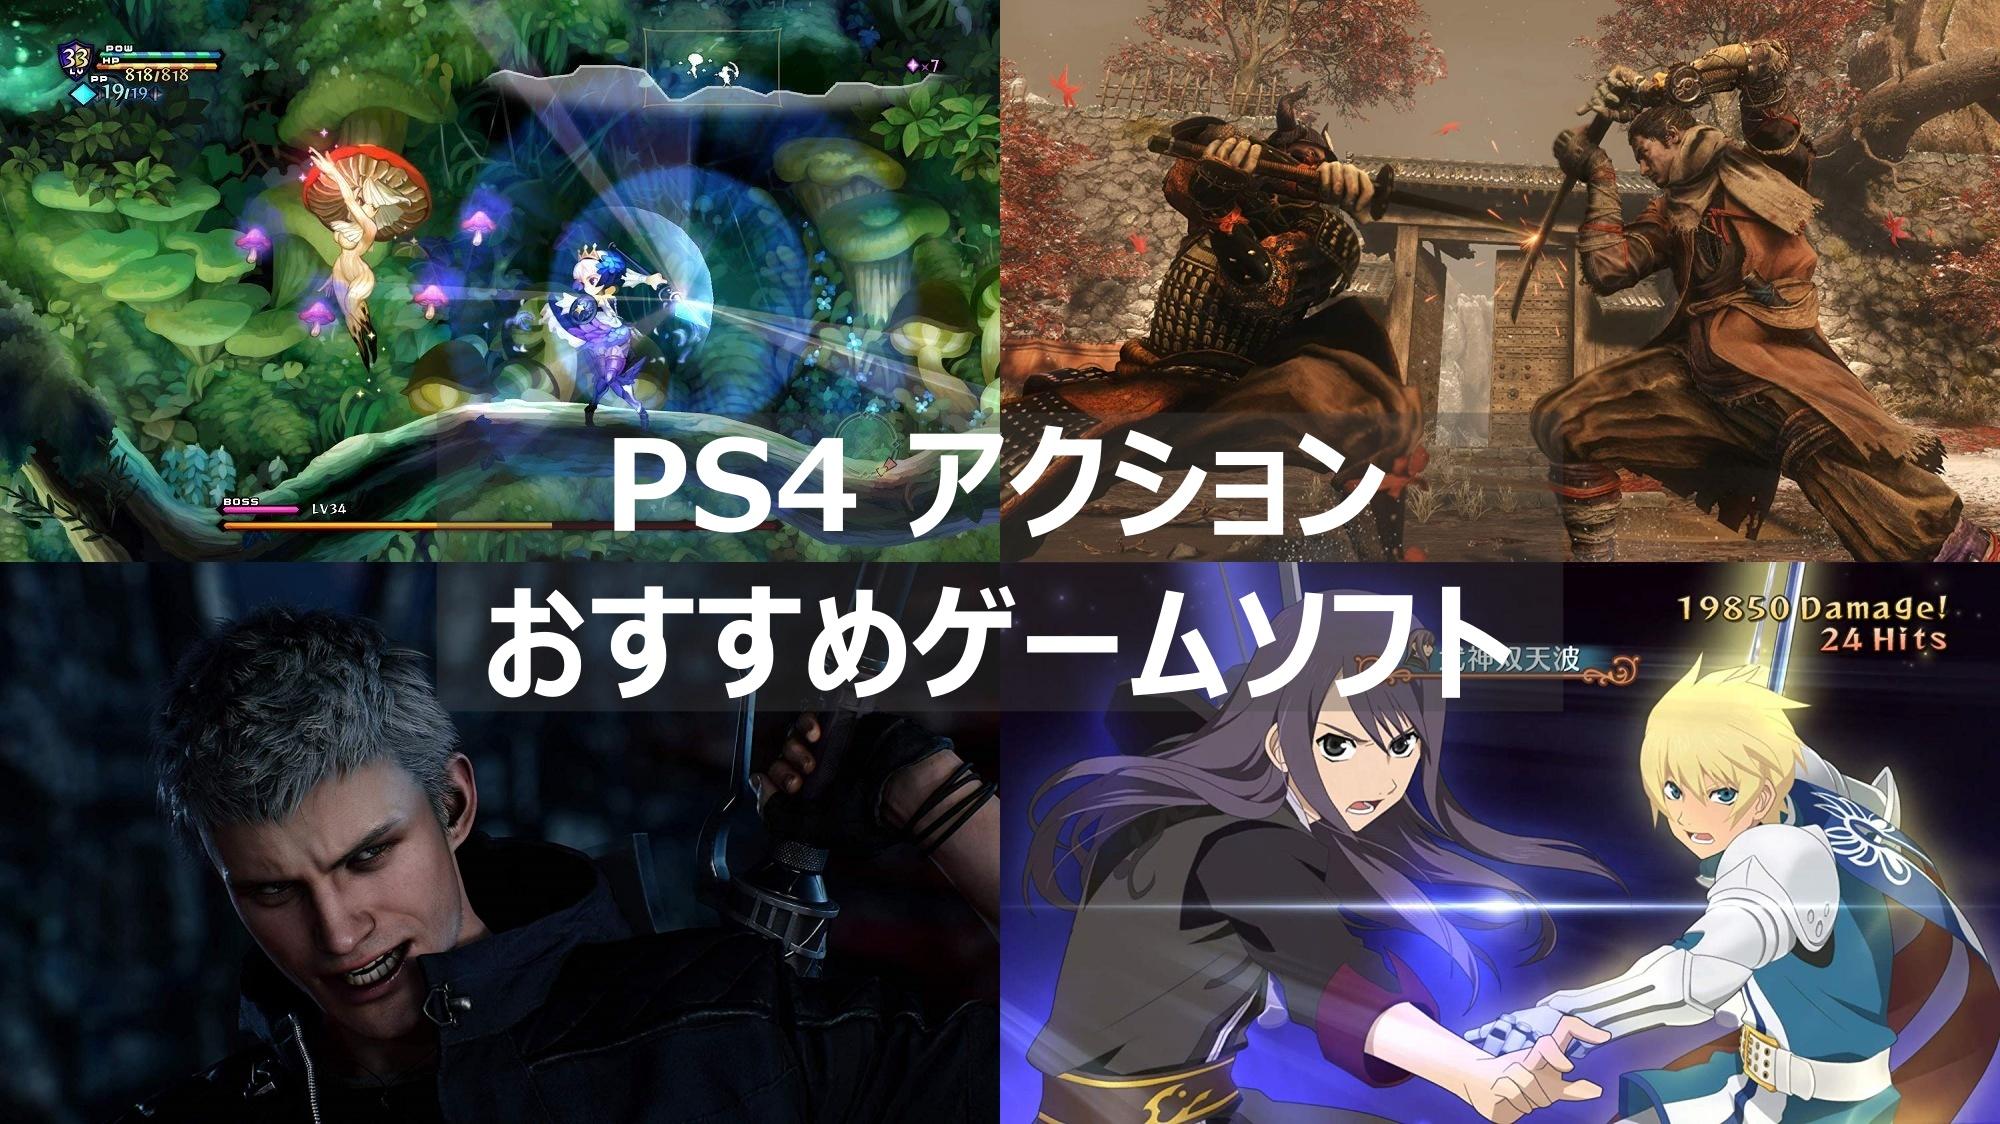 PS4】おすすめアクションゲームソフトを30本以上まとめて紹介 ...